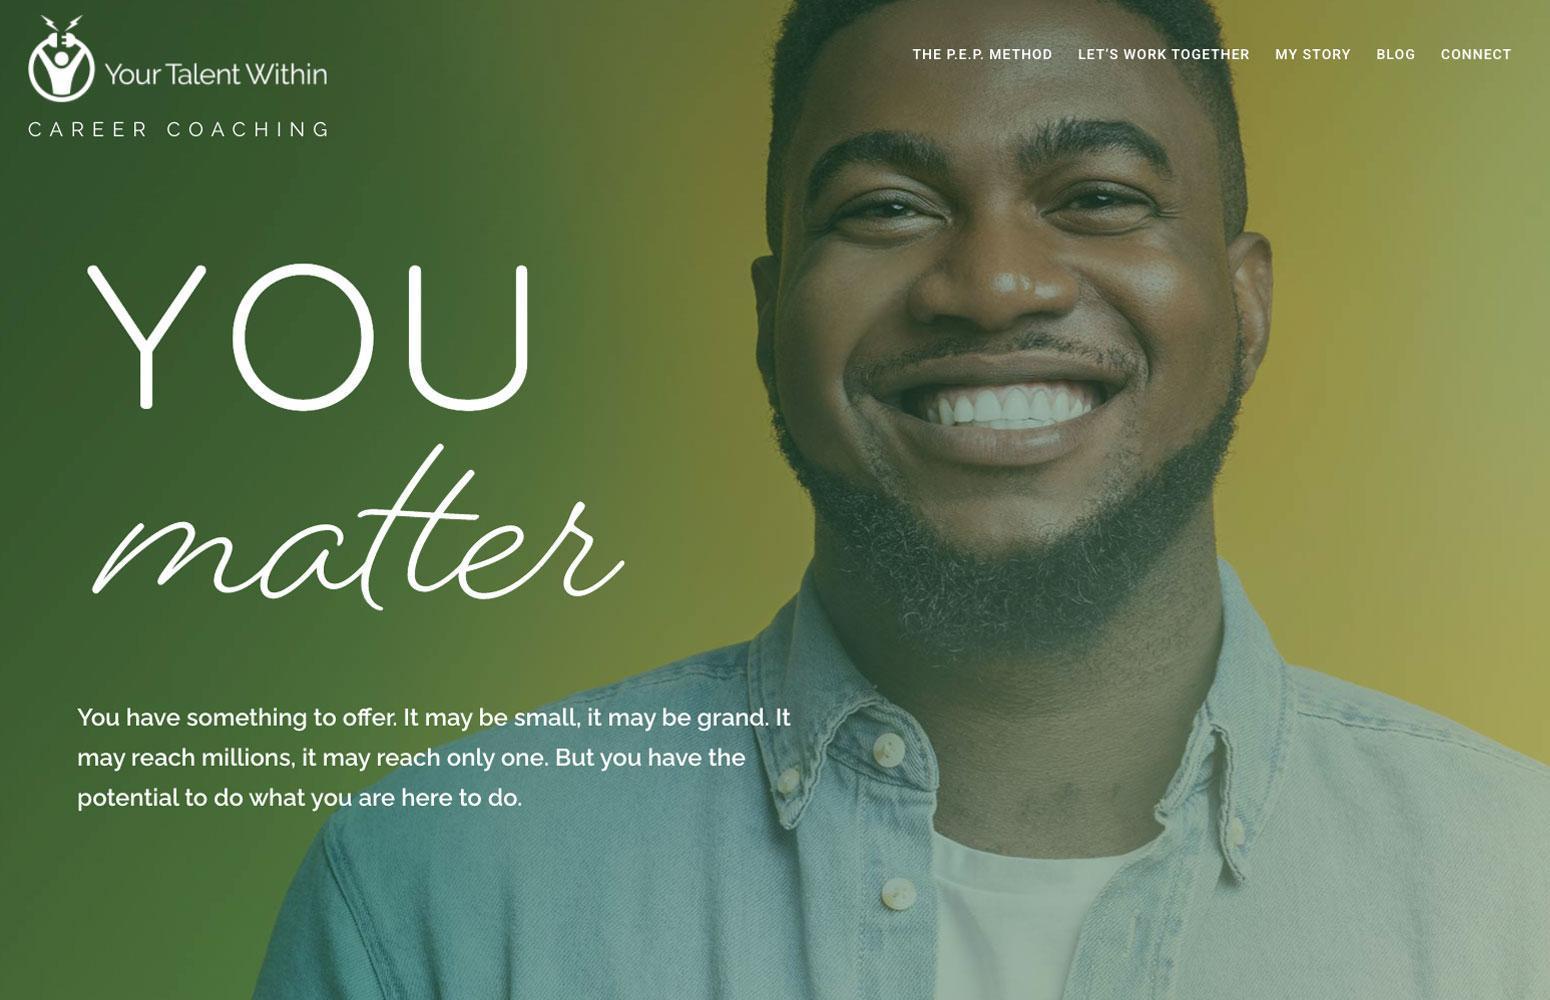 your-talent-within-wordpress-website-slider-image-man